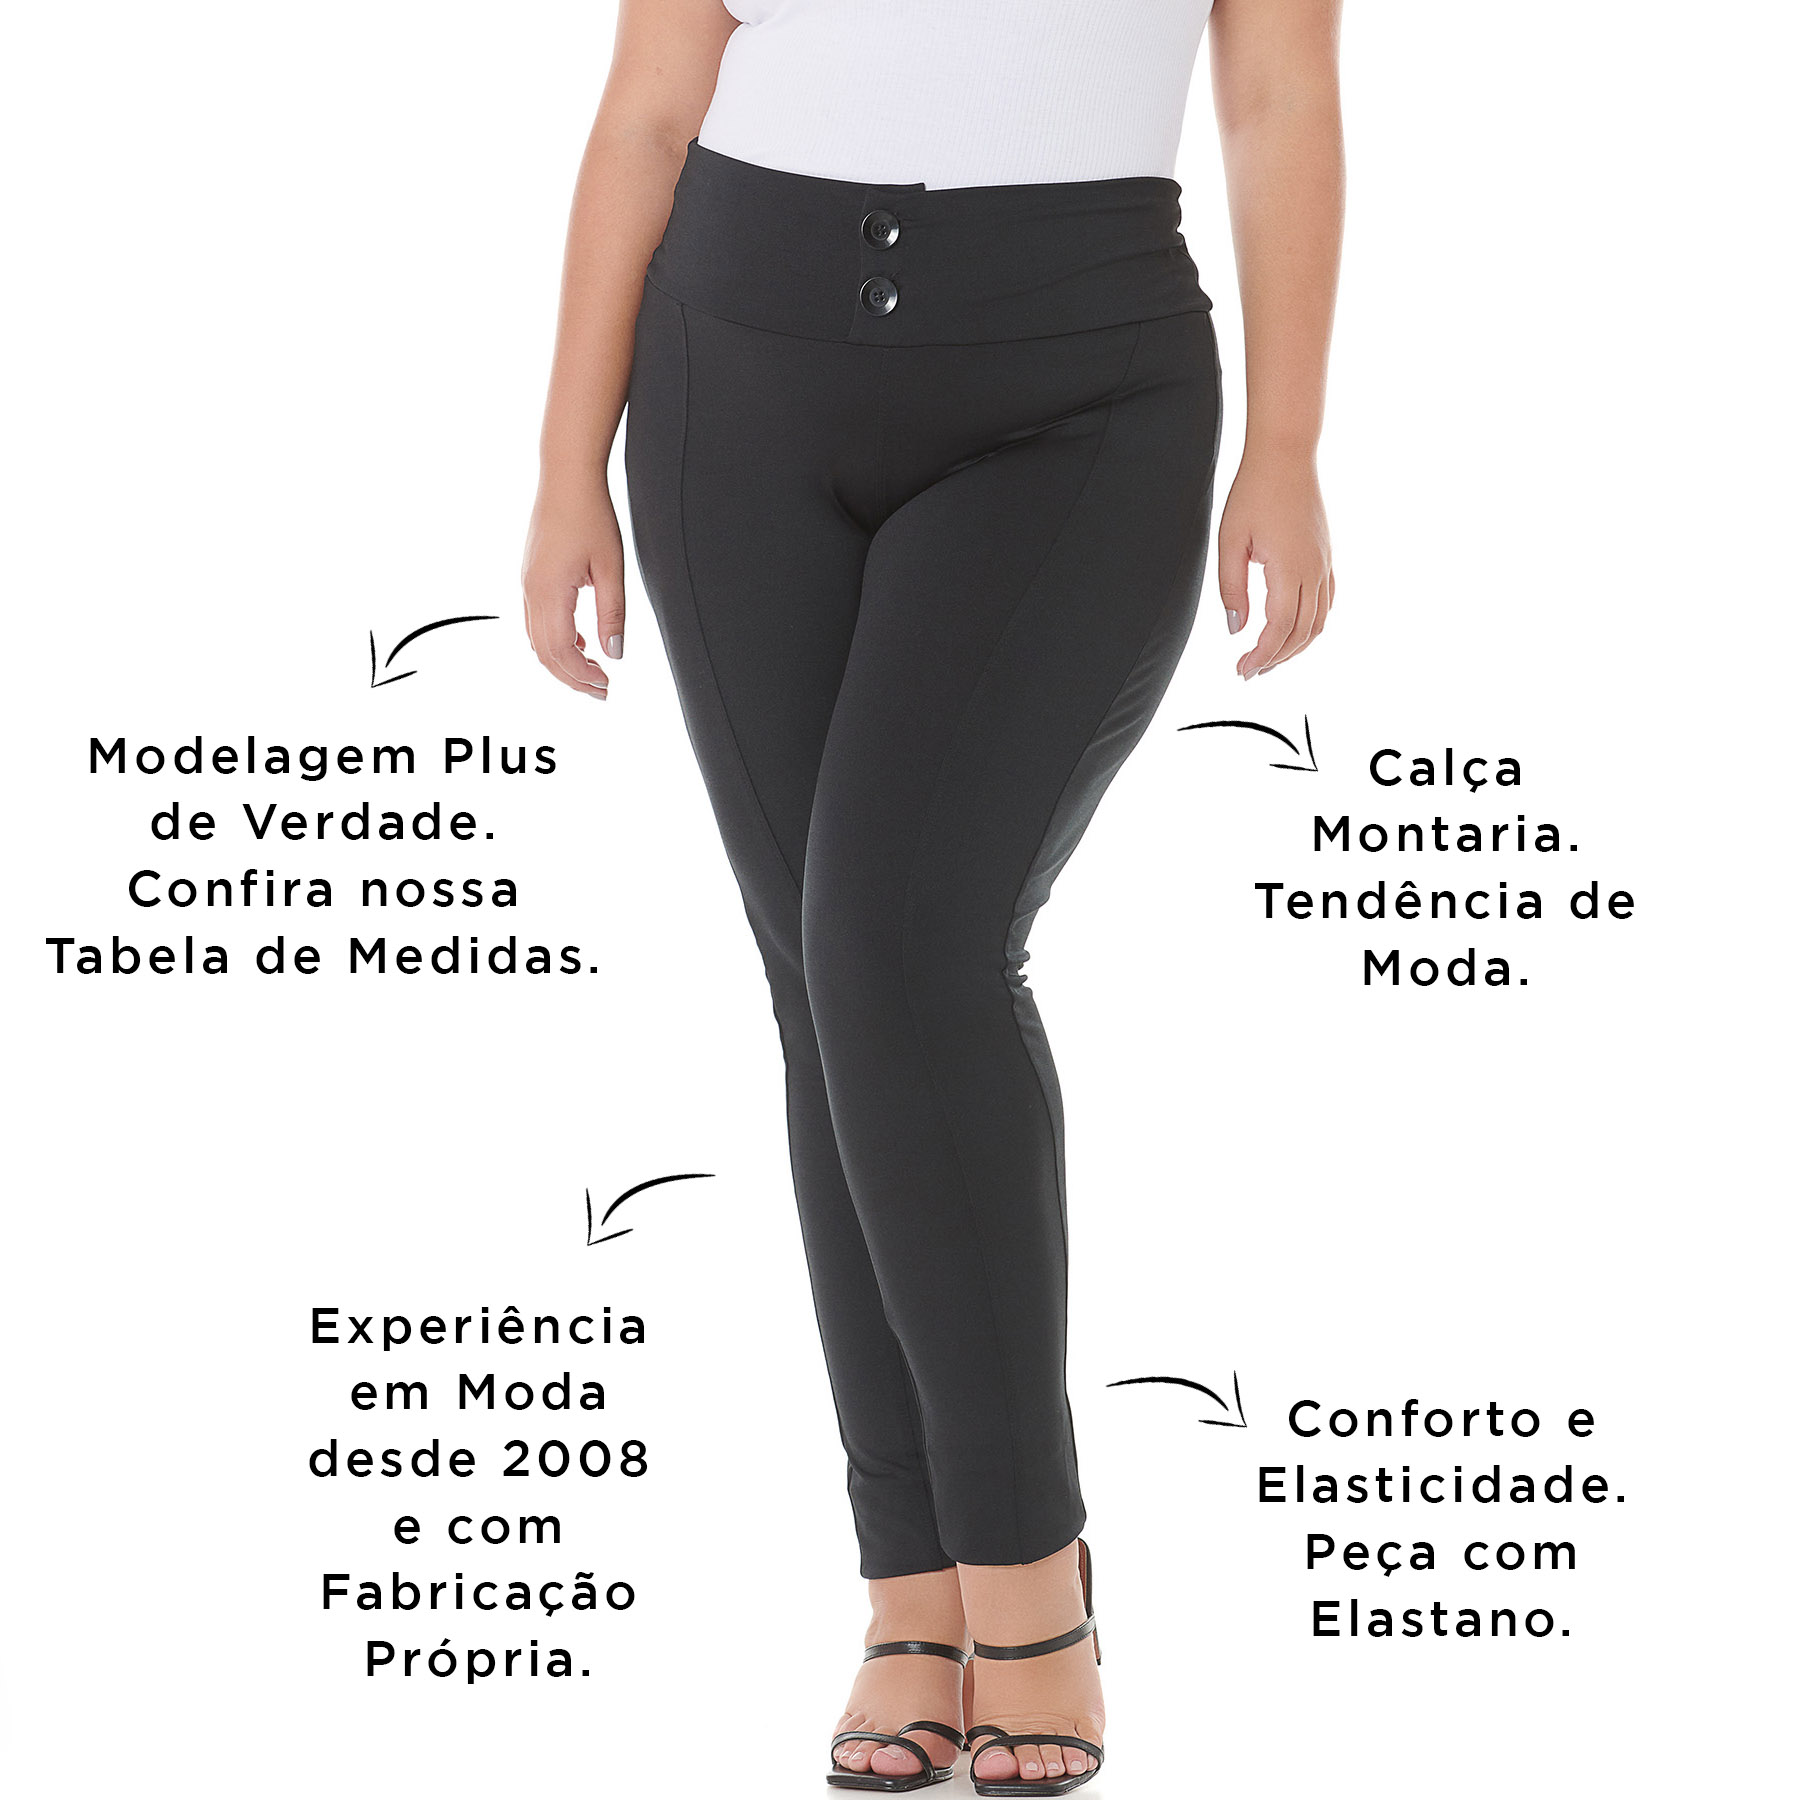 Calça Montaria Feminina 103623